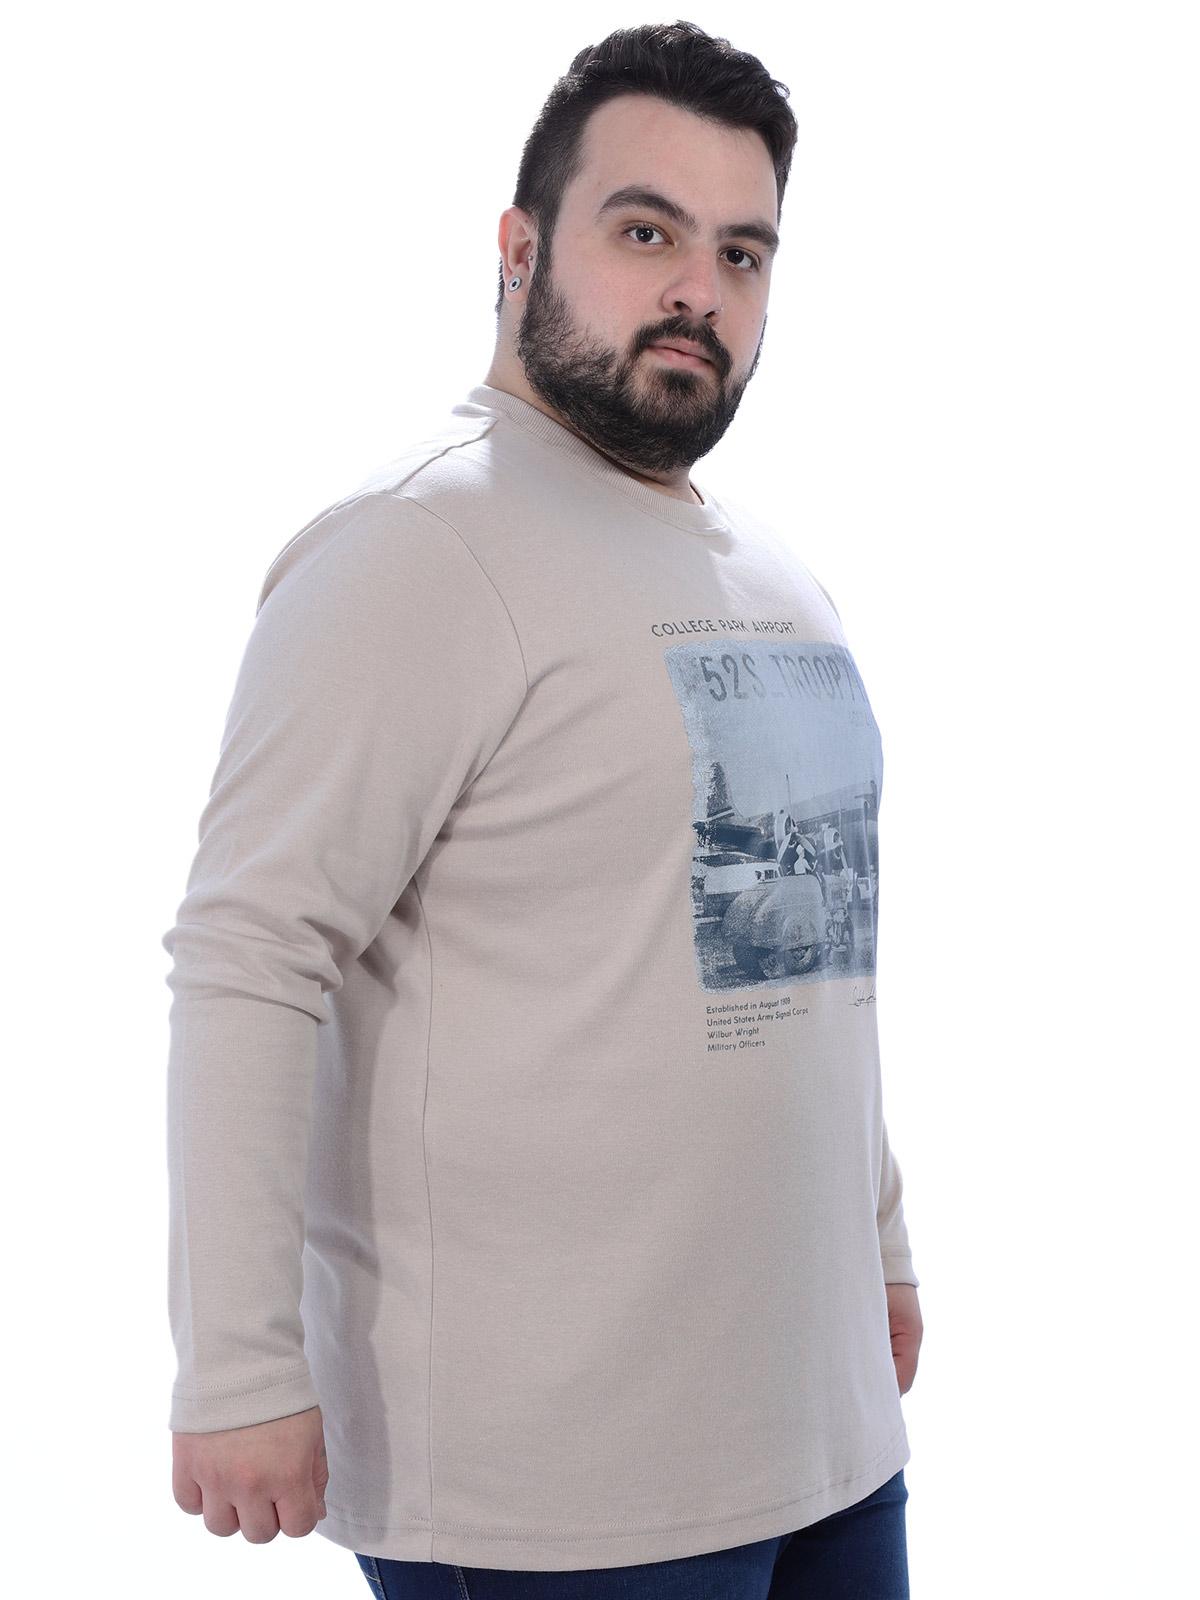 Blusa Plus Size Masculino Manga Longa Gola Careca Air Areia